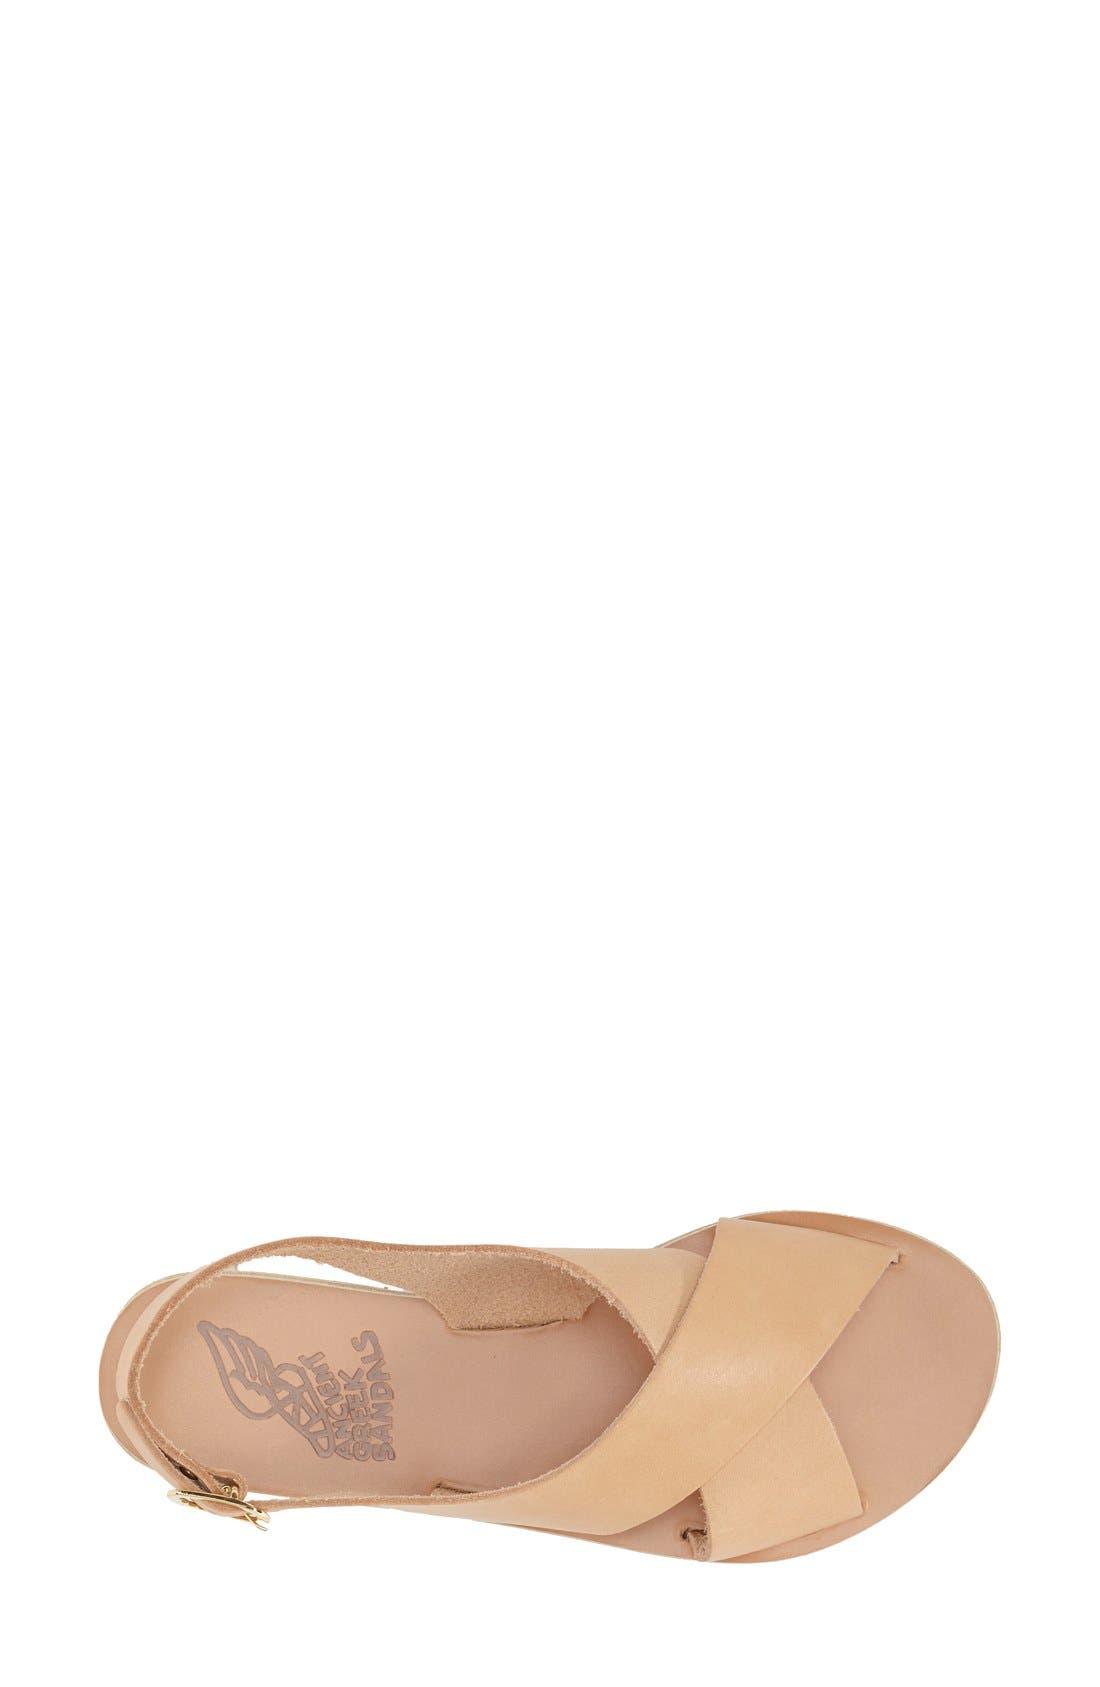 Alternate Image 3  - Ancient Greek Sandals 'Maria' Leather Slingback Sandal